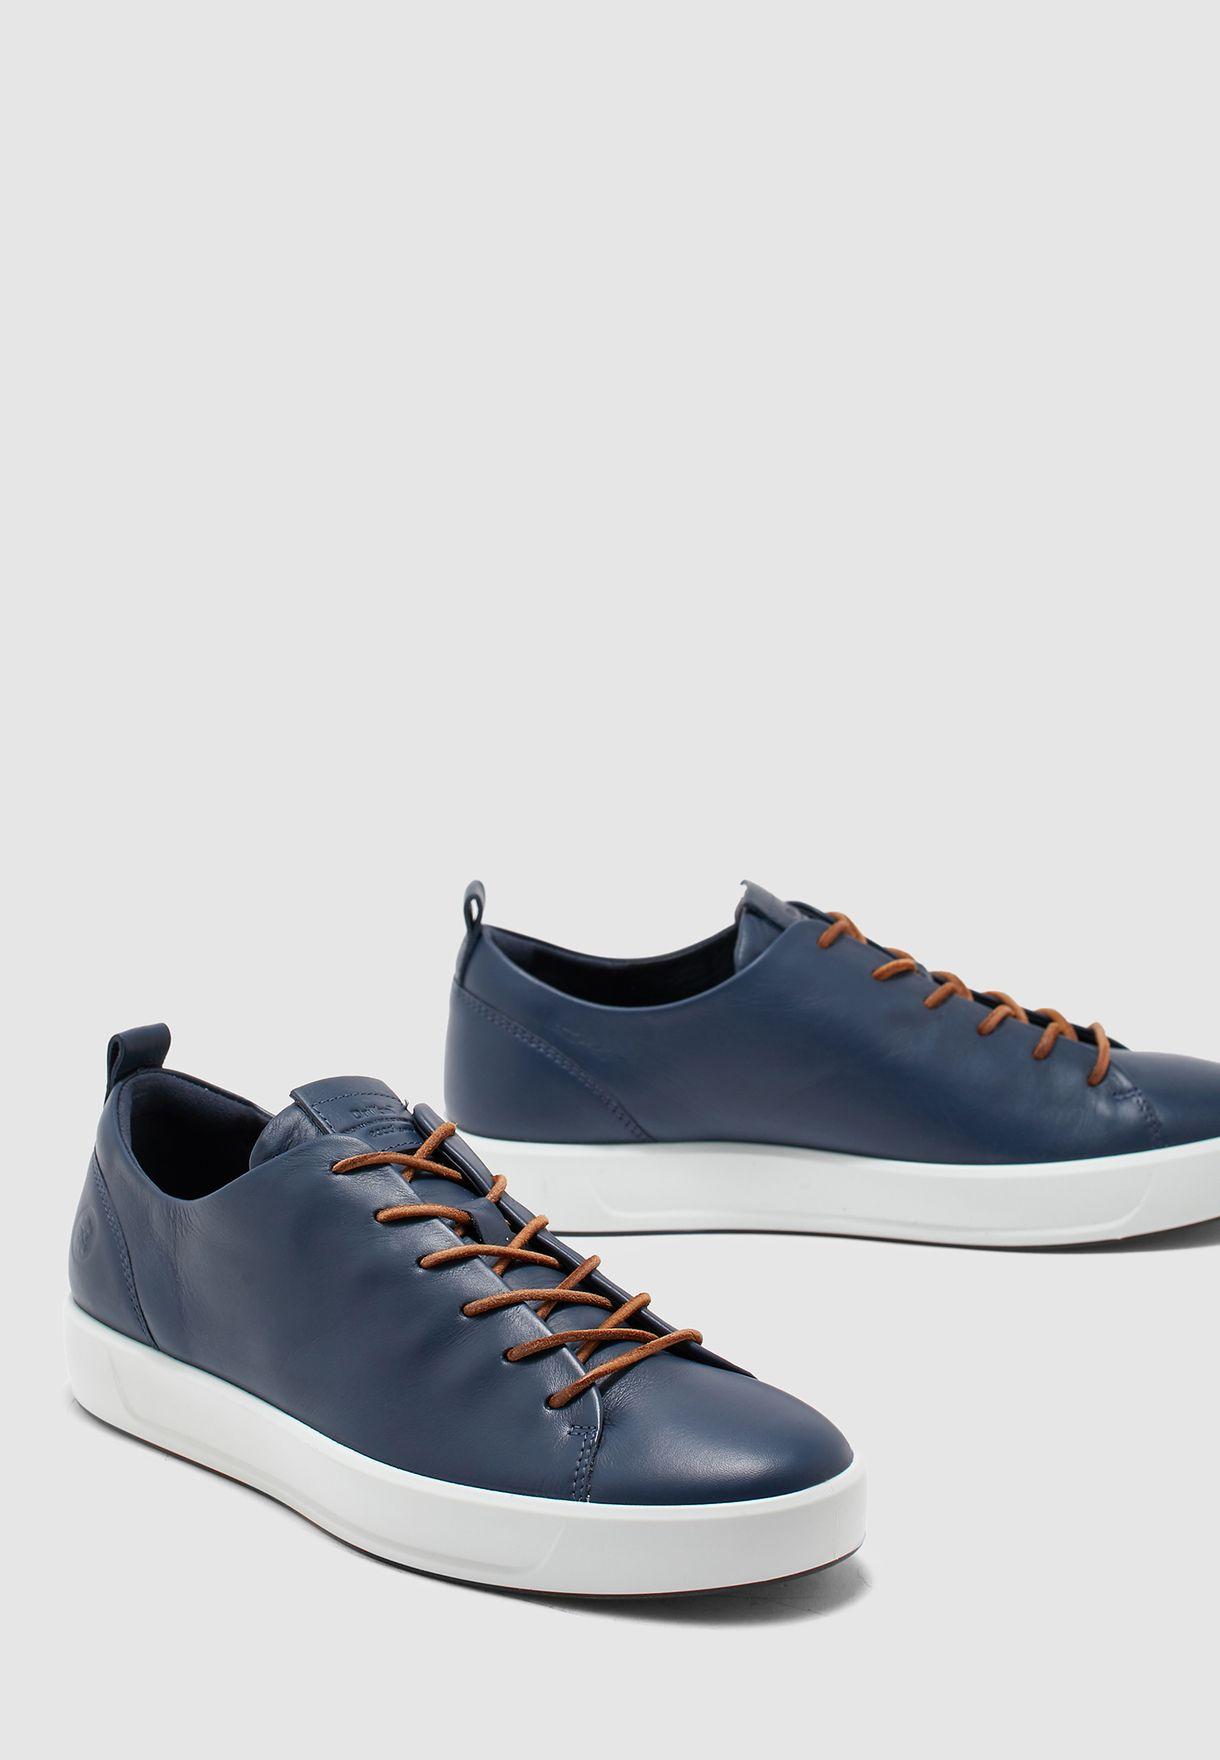 Shop Ecco navy Soft 8 Dritan Sneakers